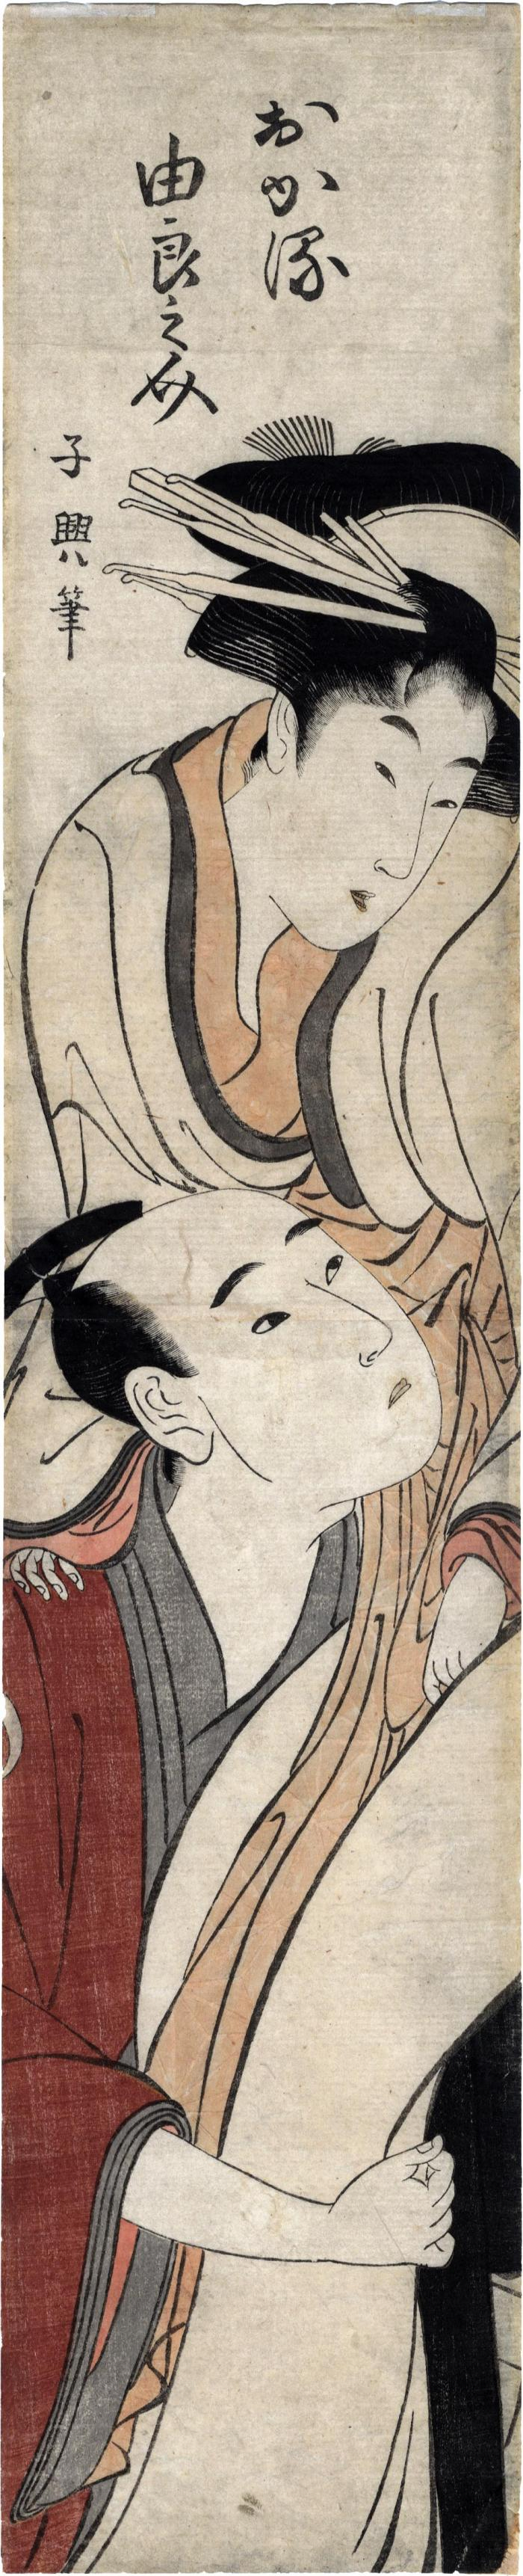 Okaru (おかる) and Yuranosuke (由良之助) in a scene from the Chūshingura